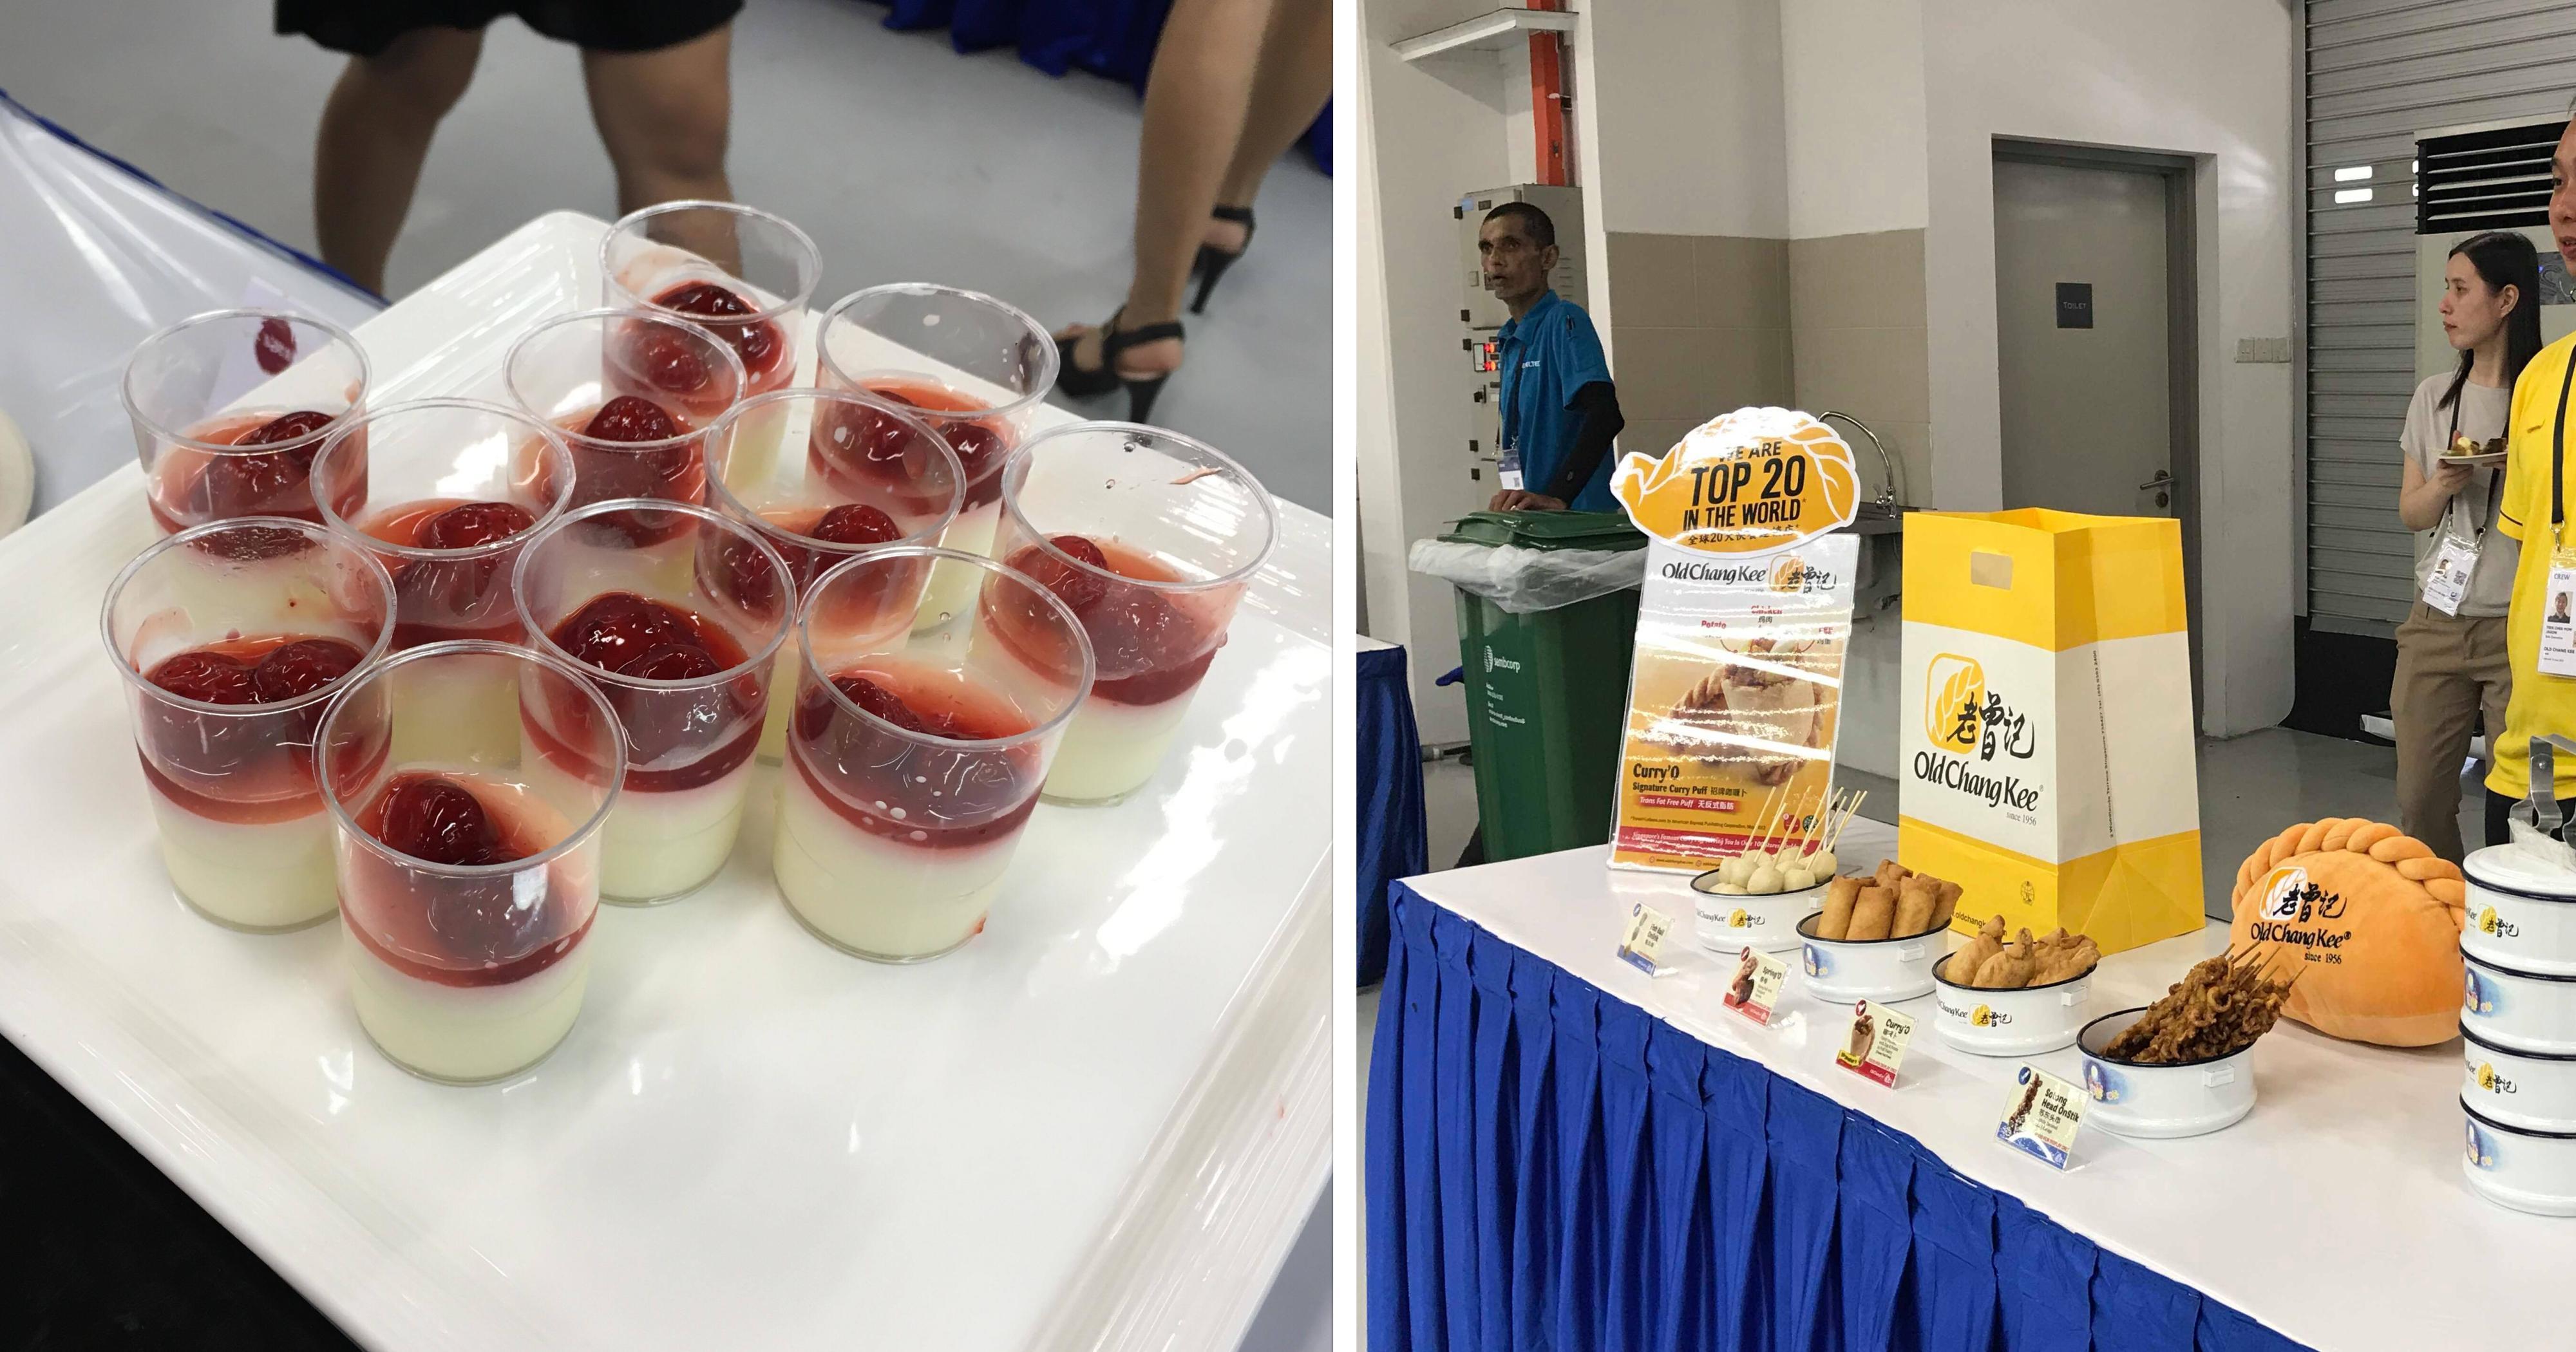 Journalists fed copious amounts of free good food at F1 Pit Building Trump-Kim summit media centre